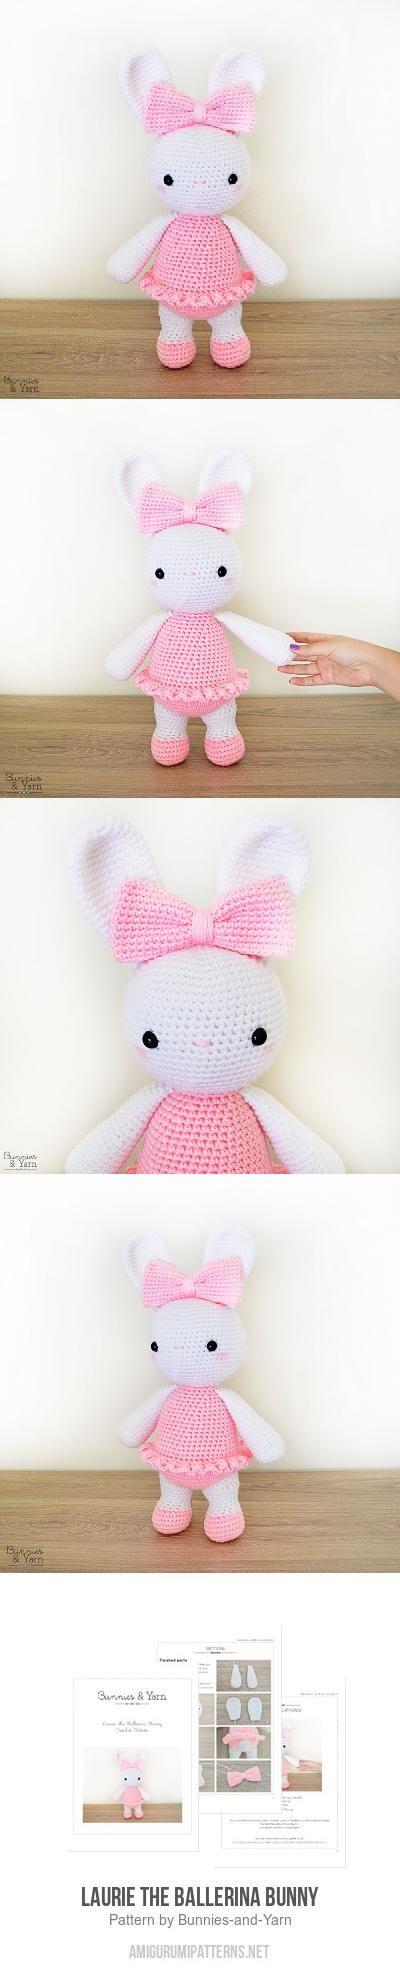 Laurie The Ballerina Bunny Amigurumi Pattern